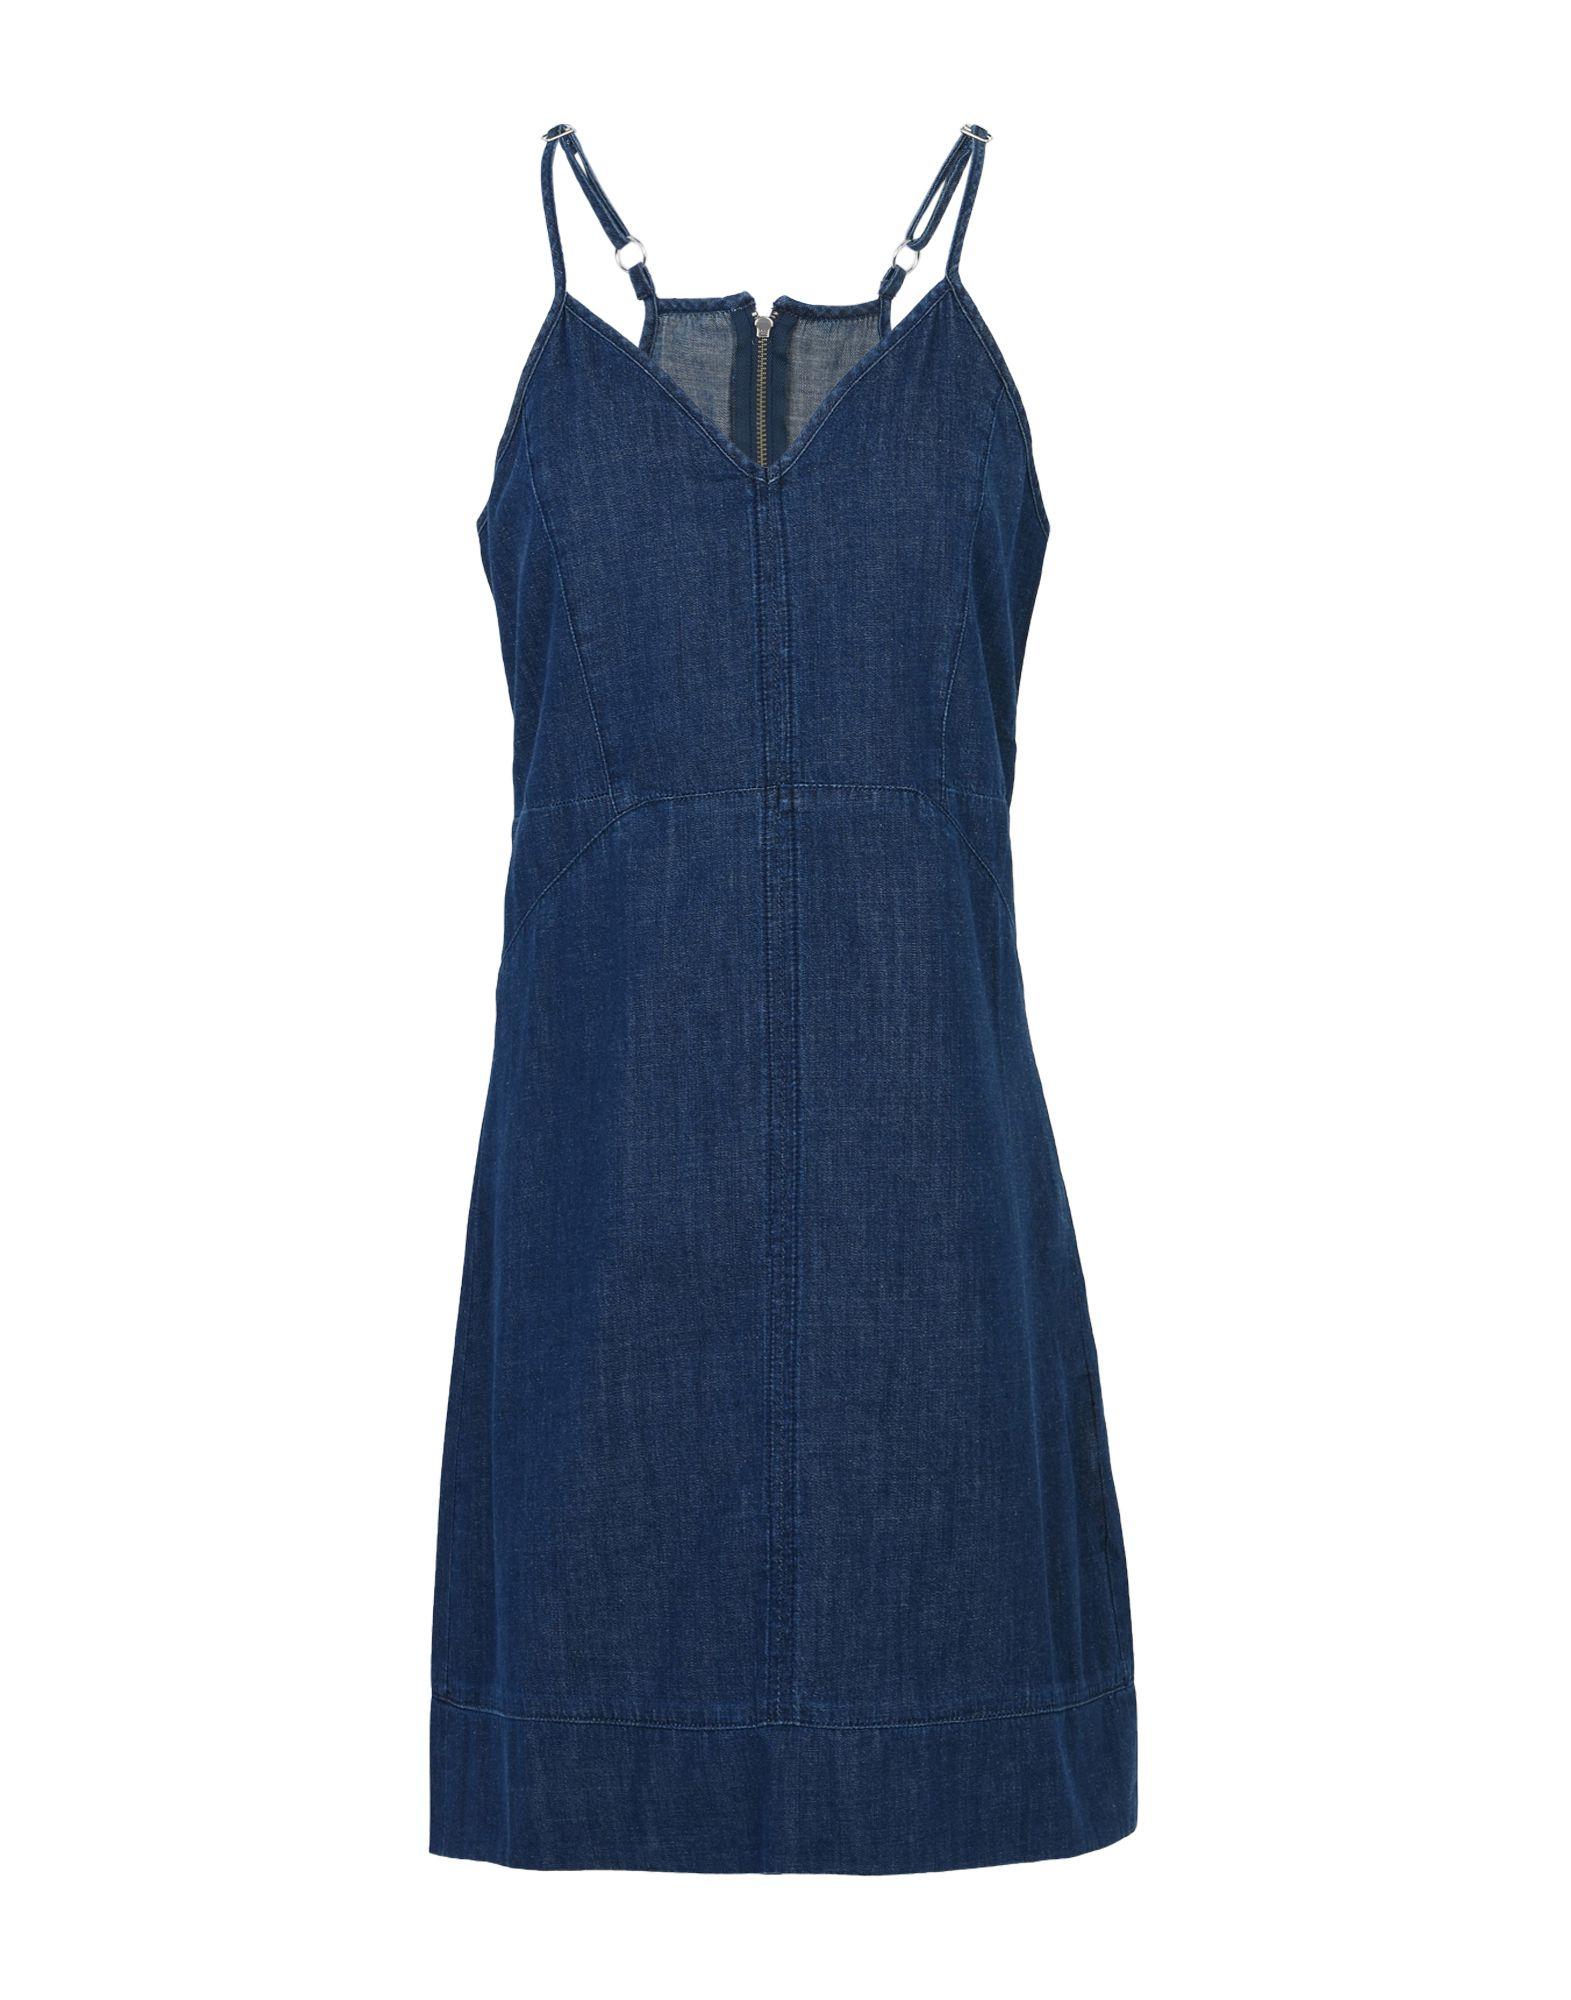 CALVIN KLEIN JEANS Короткое платье calvin klein jeans топ без рукавов